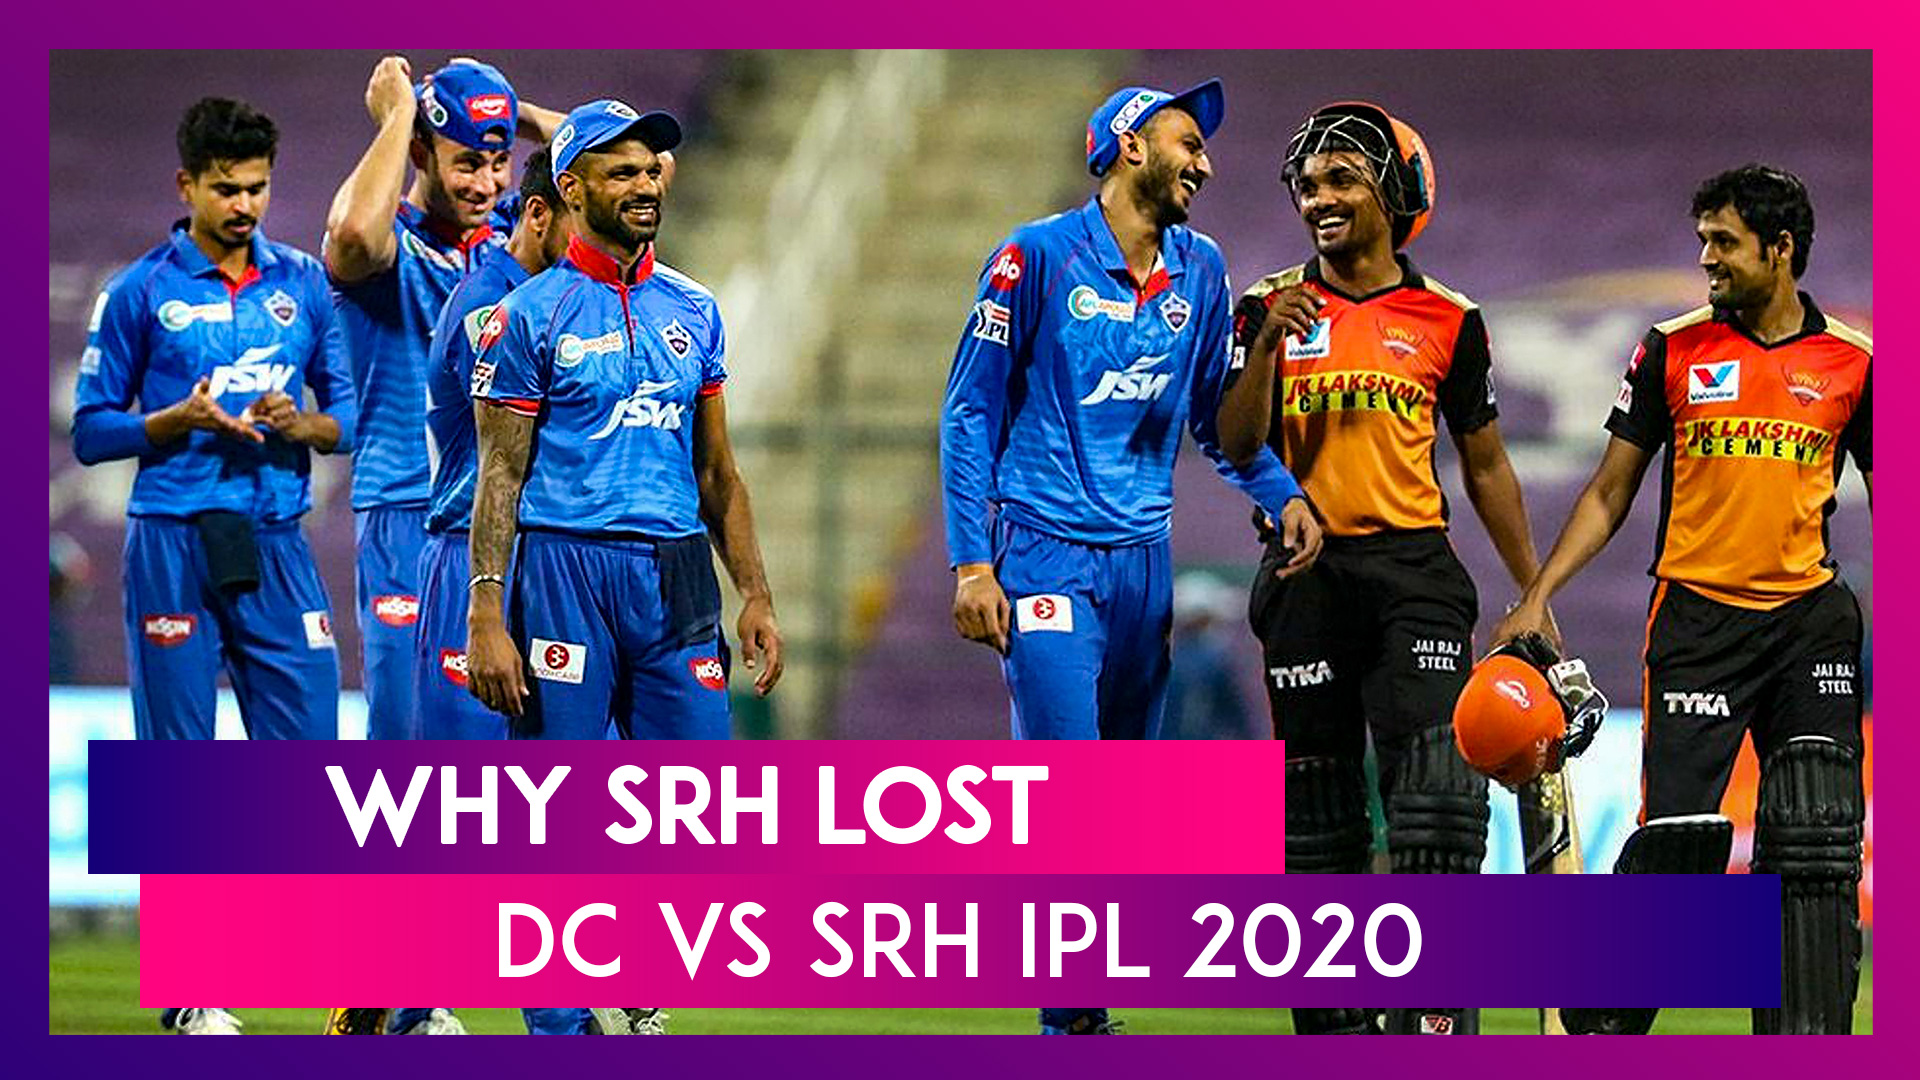 Delhi vs Hyderabad IPL 2020: 3 Reasons Why Hyderabad Lost To Delhi